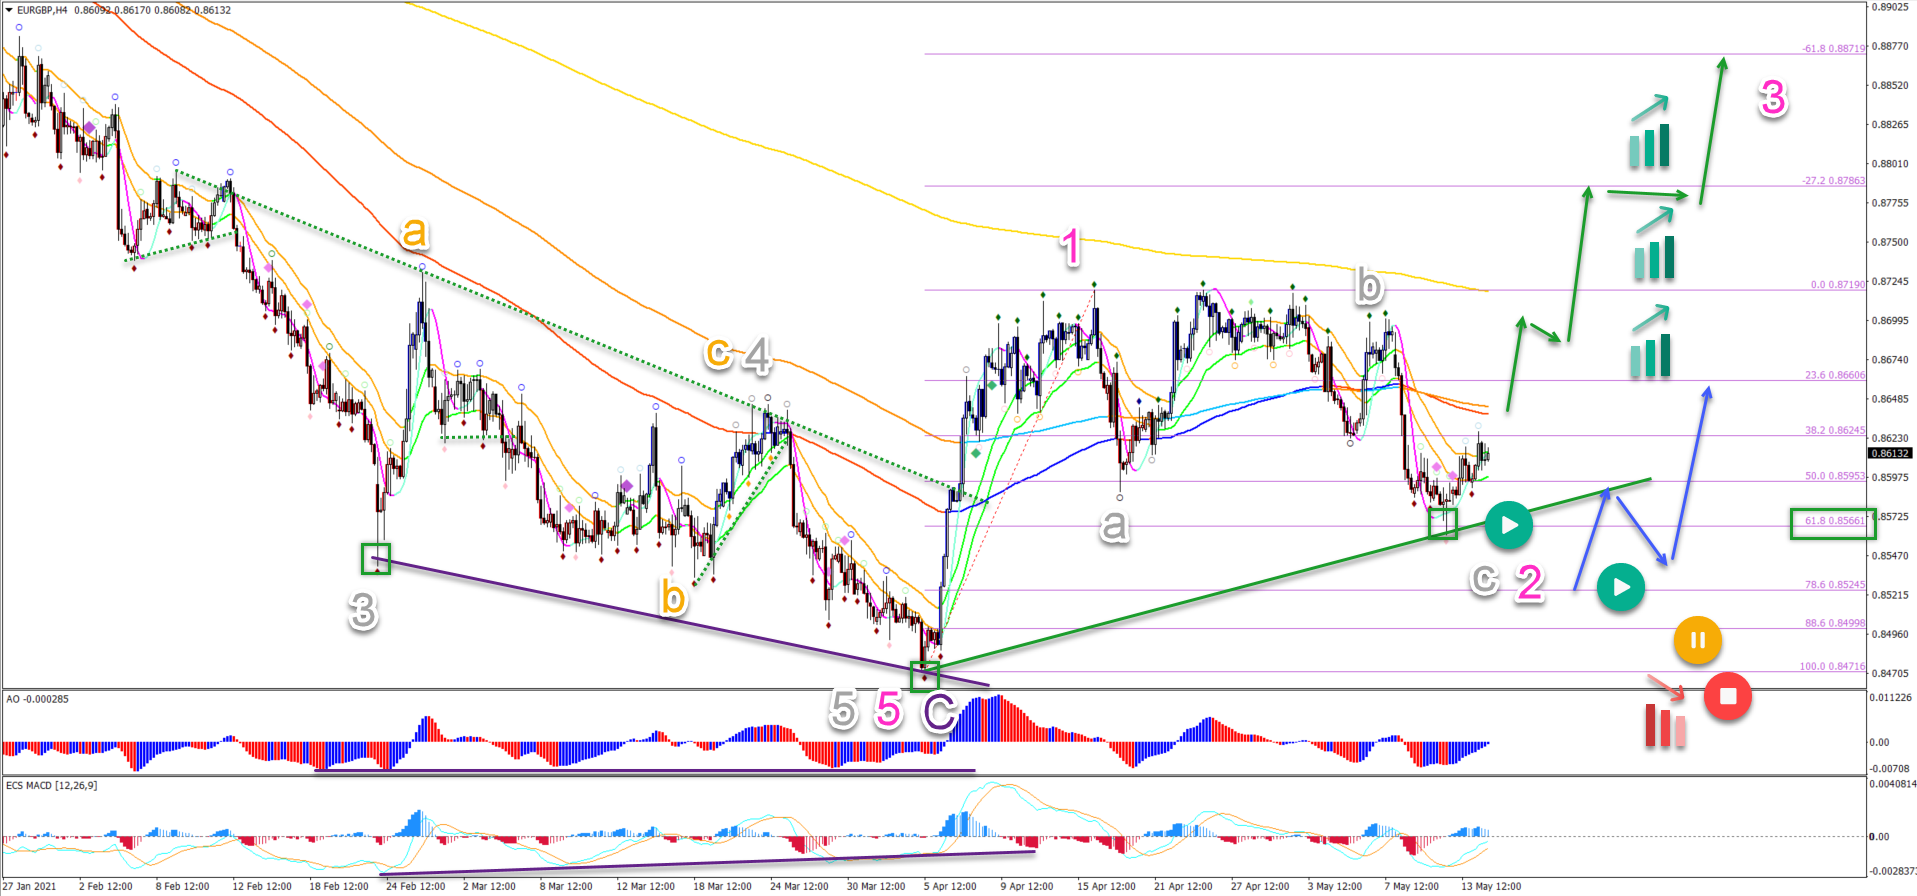 EUR/GBP 16.5.2021 4 hour chart